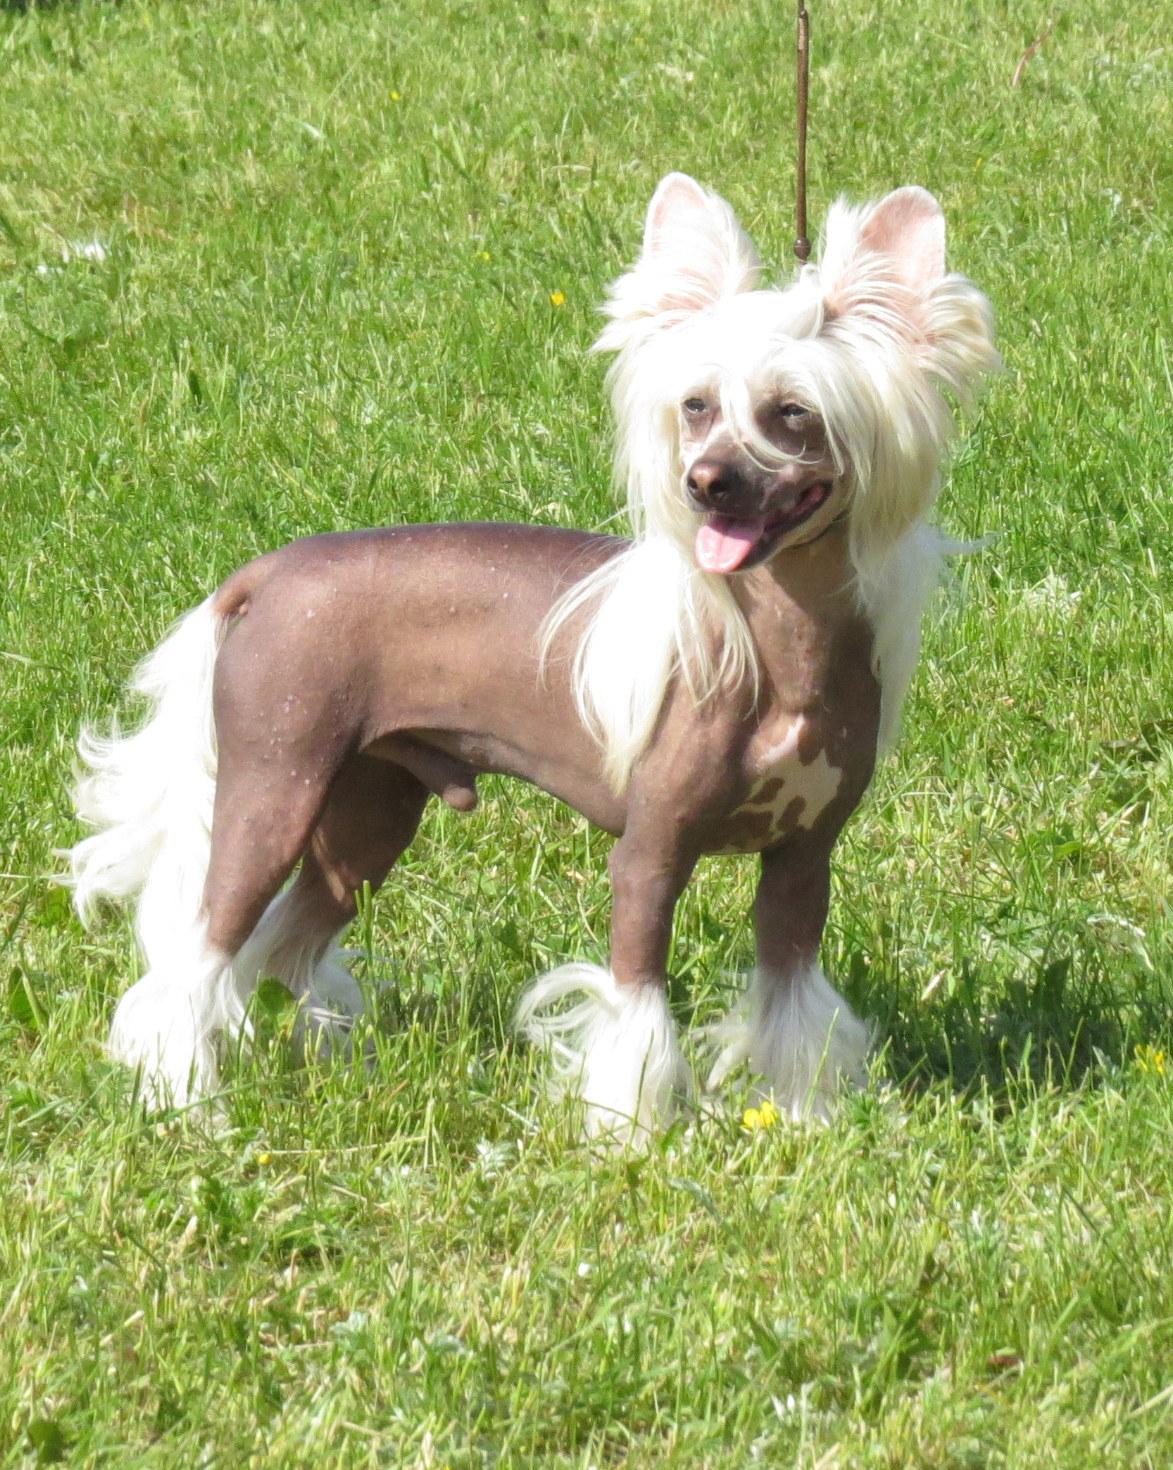 Chinese Crested Dog - Wikipedia